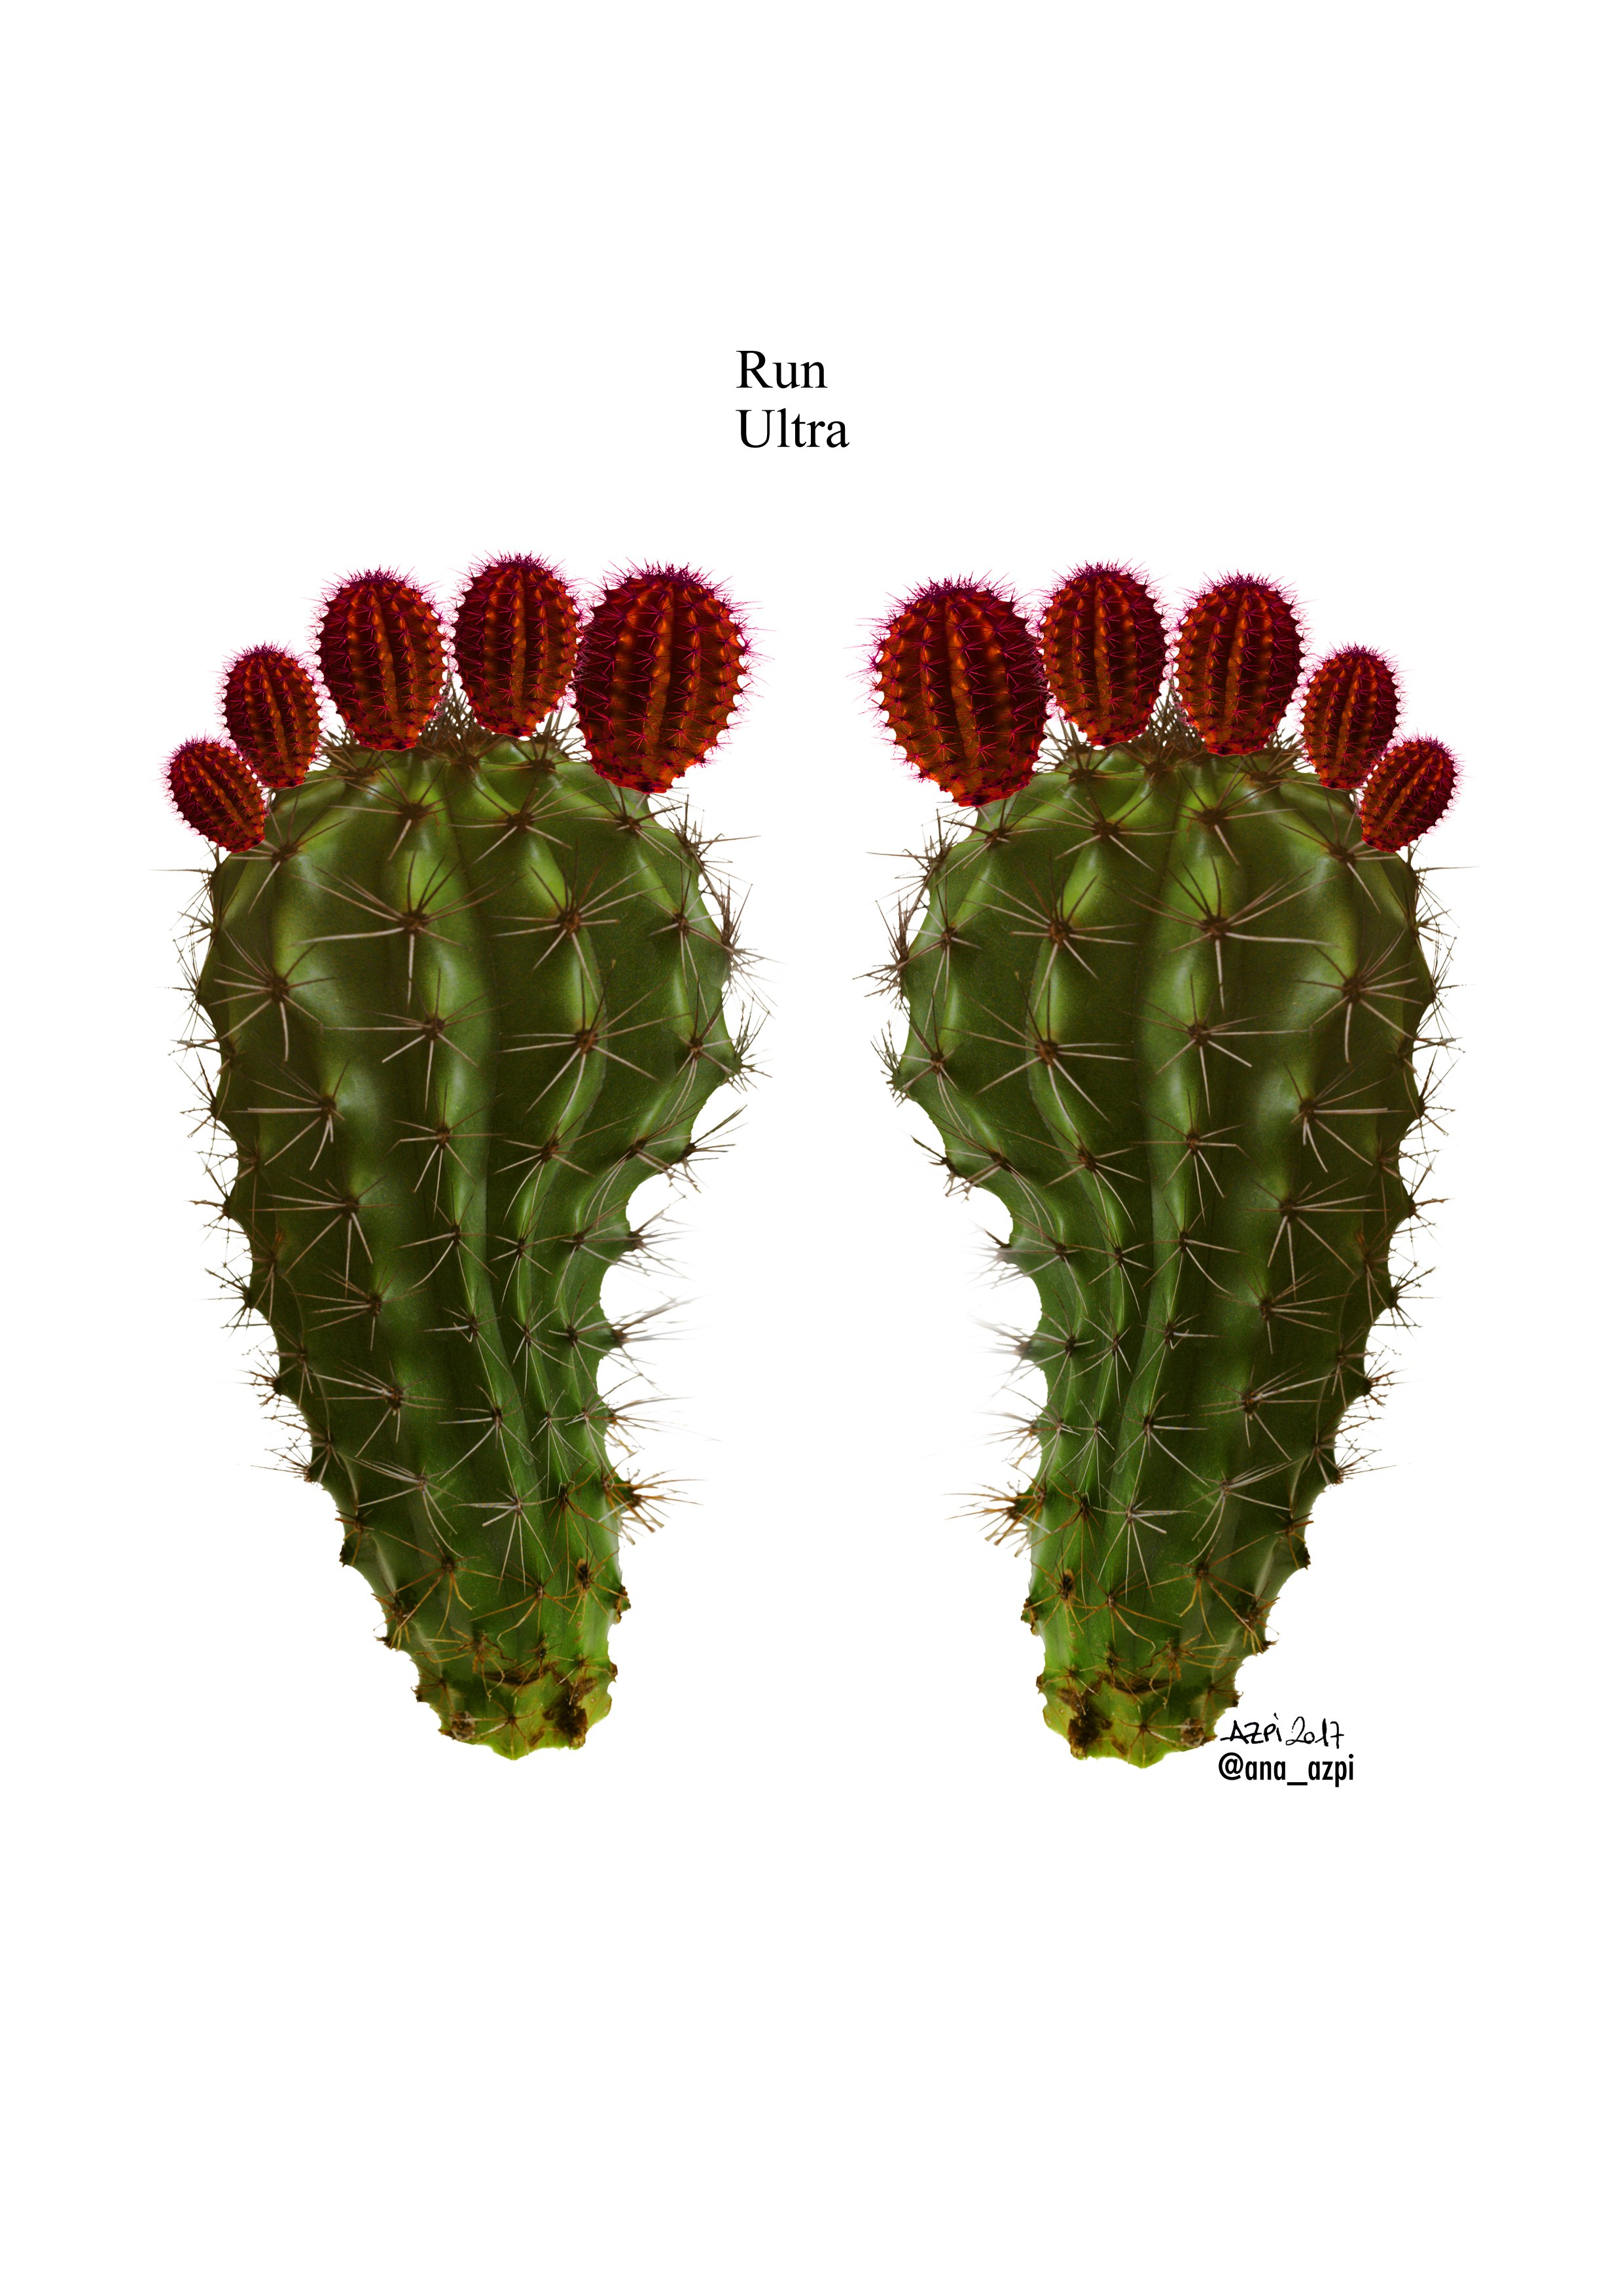 cactus_ultra_run